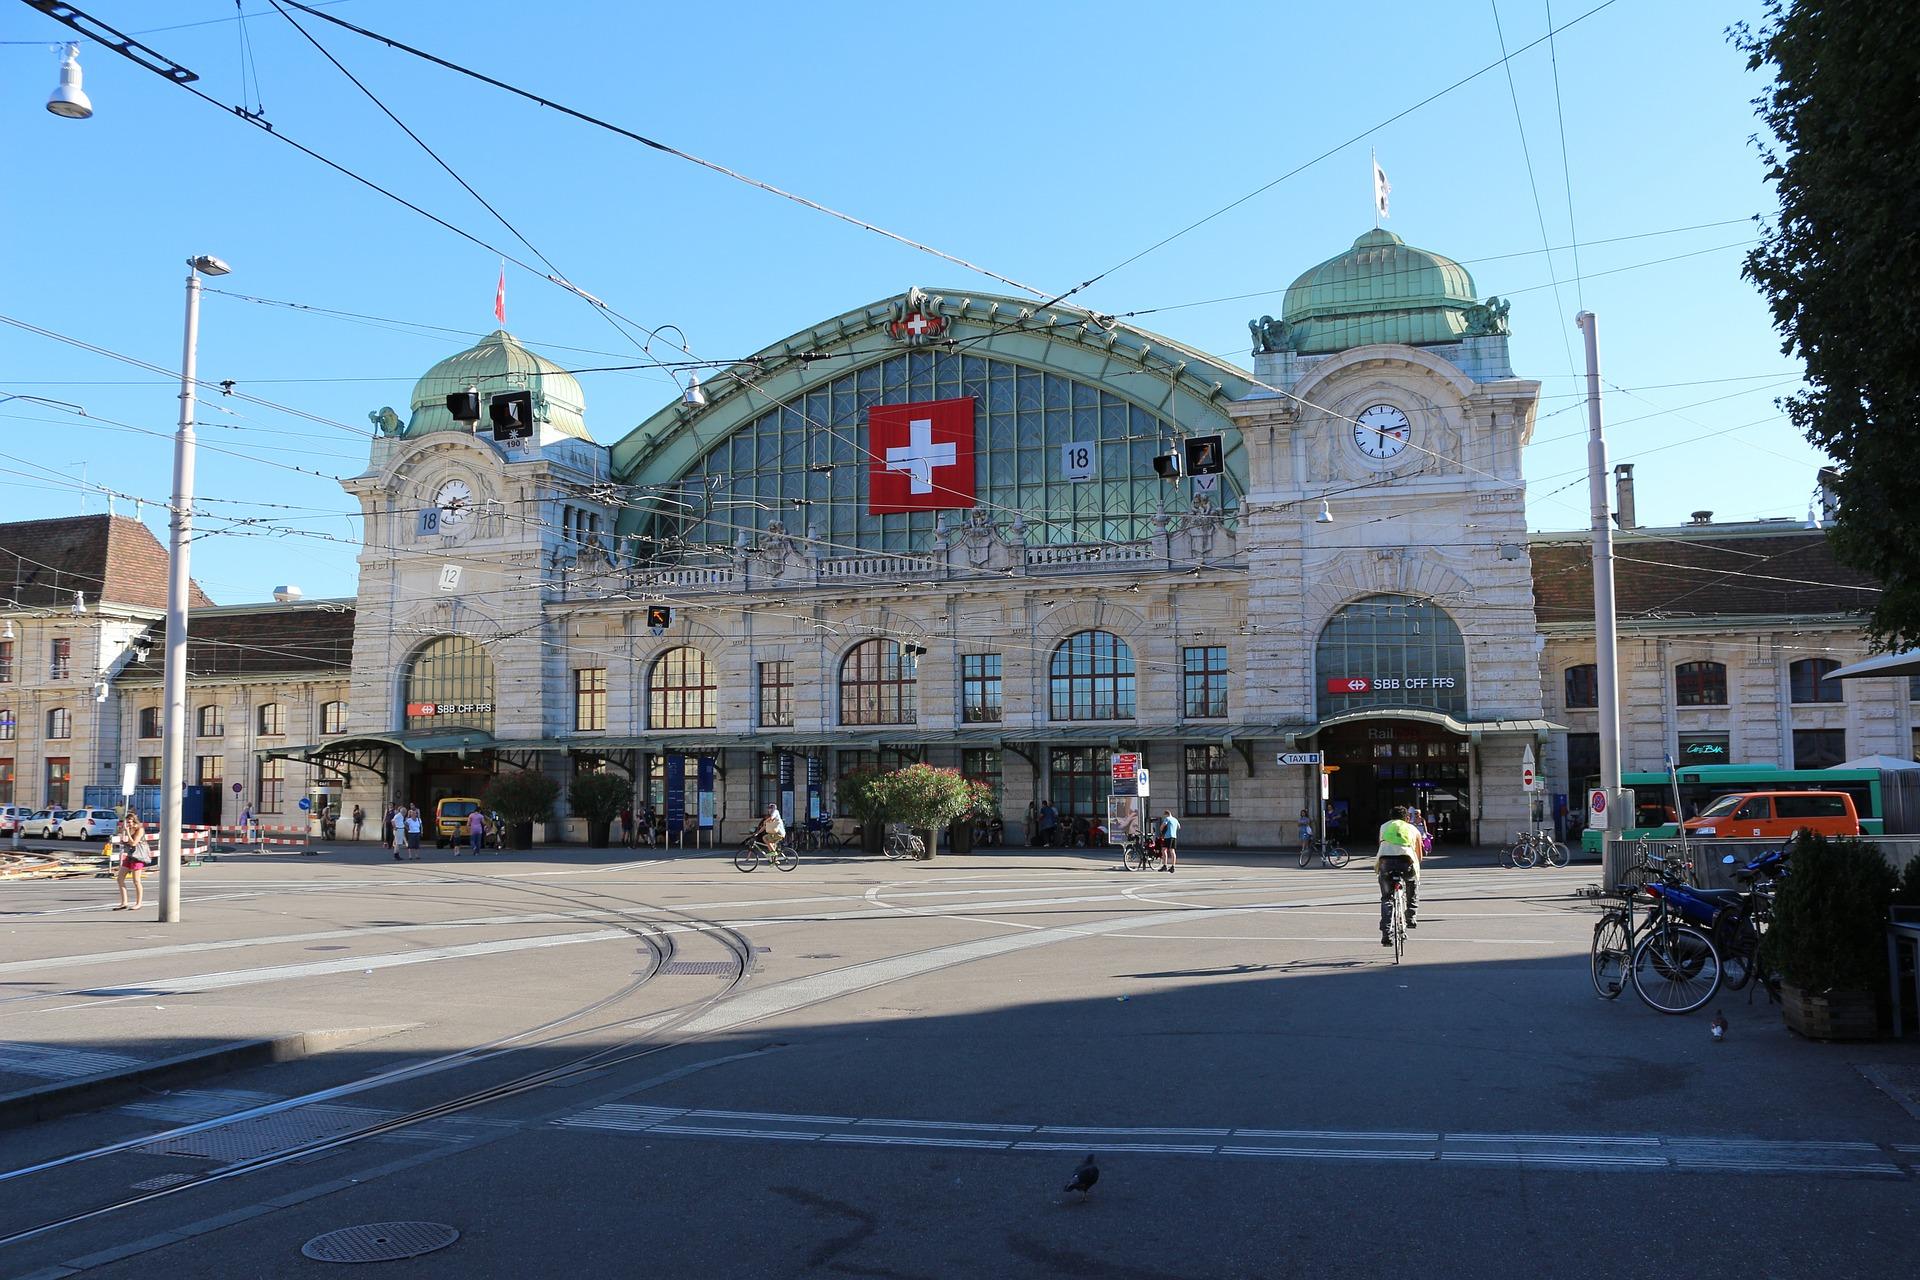 basel tren istasyonu 1